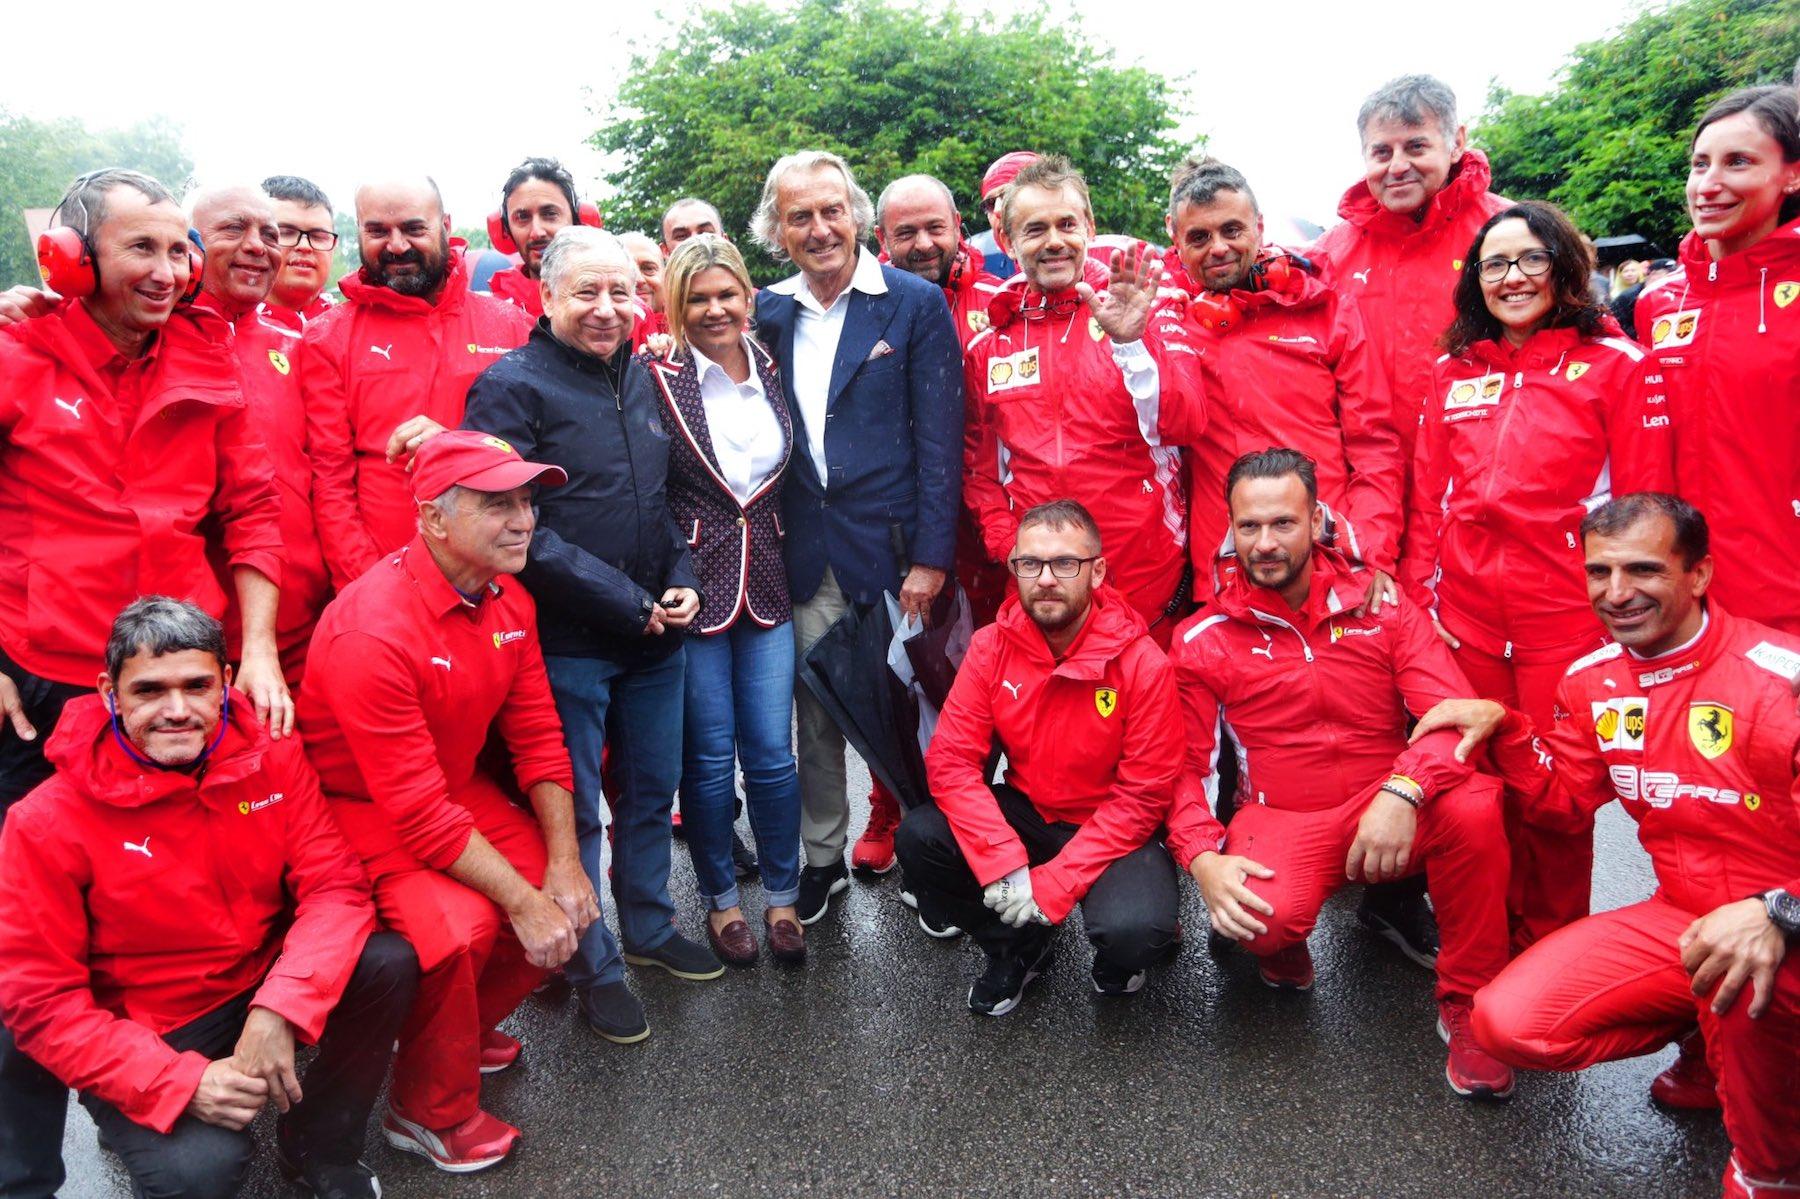 Jean Todt, Corinna Schumacher, Luca di Montezemolo, and the Scuderia Ferrari crew